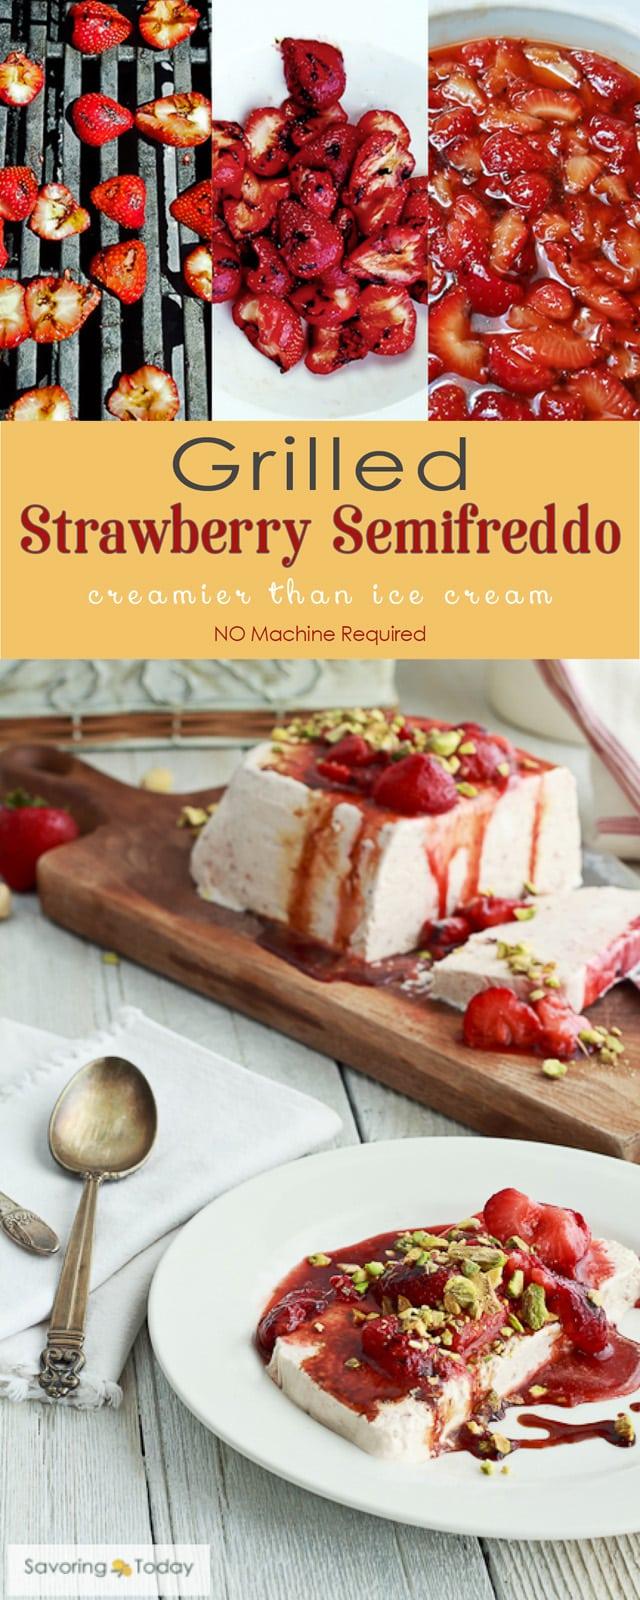 Easy, no machine required frozen dessert recipe perfect for summer celebrations.